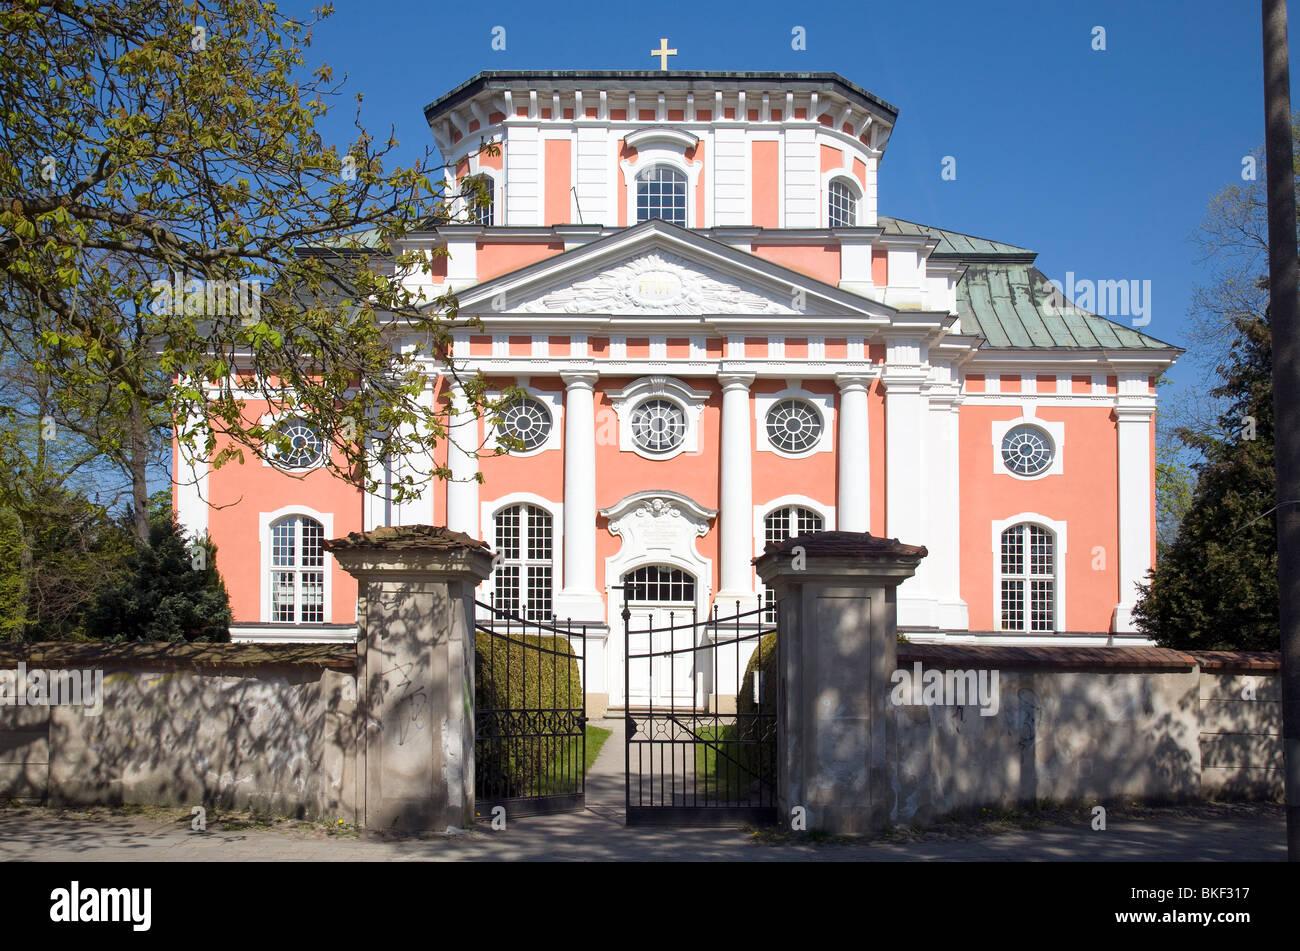 Schloss Kirche, Buch, Berlin, Germany - Stock Image